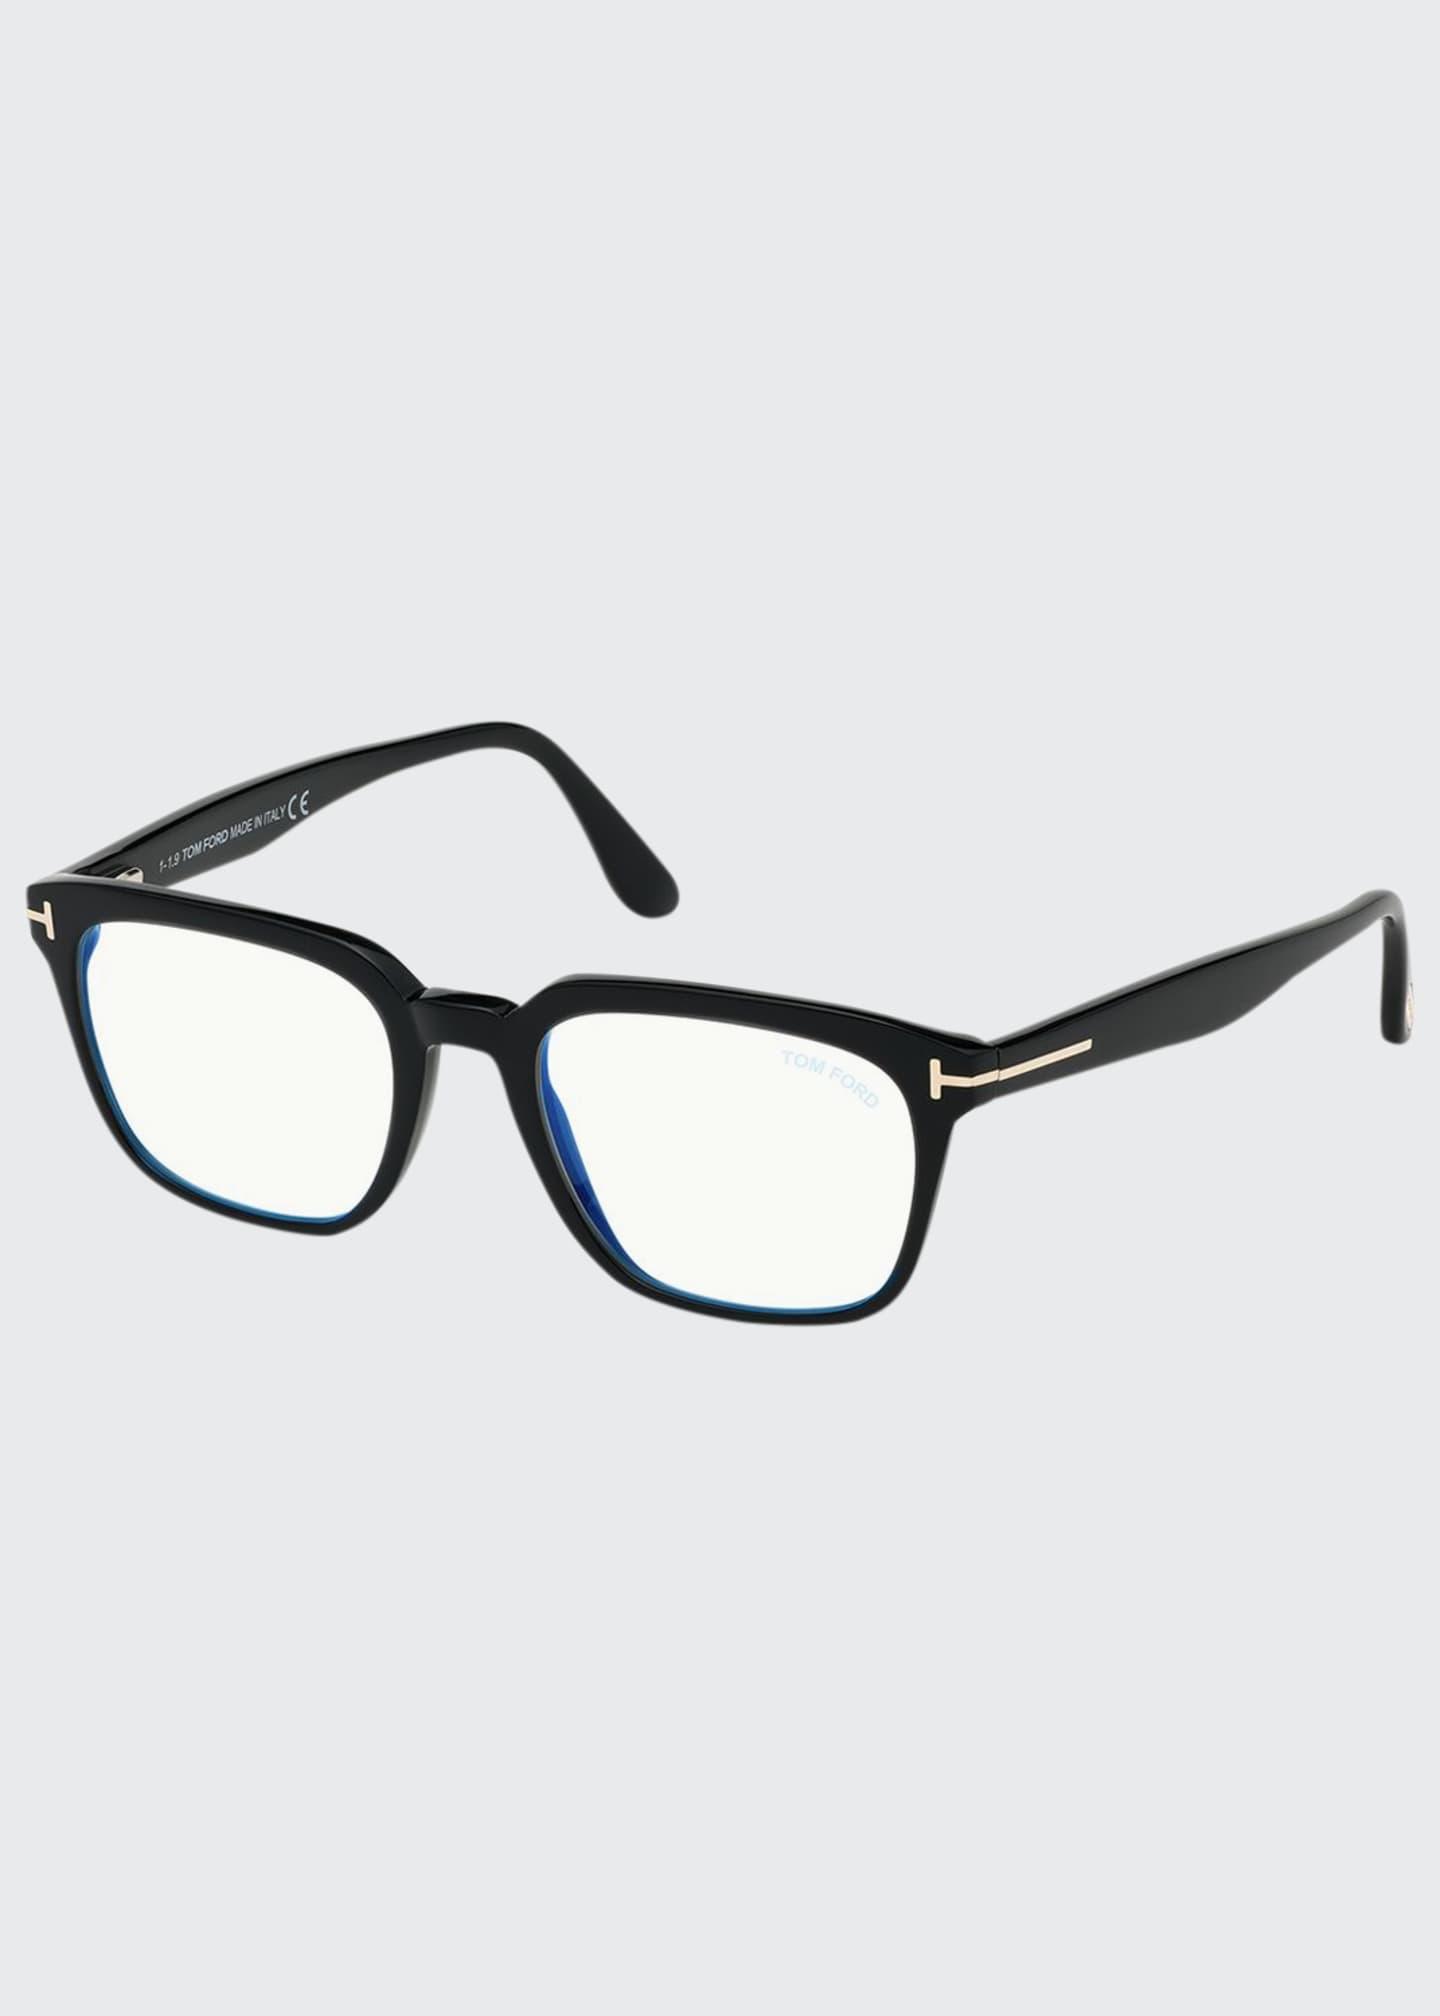 TOM FORD Men's Square Solid Acetate Optical Frames